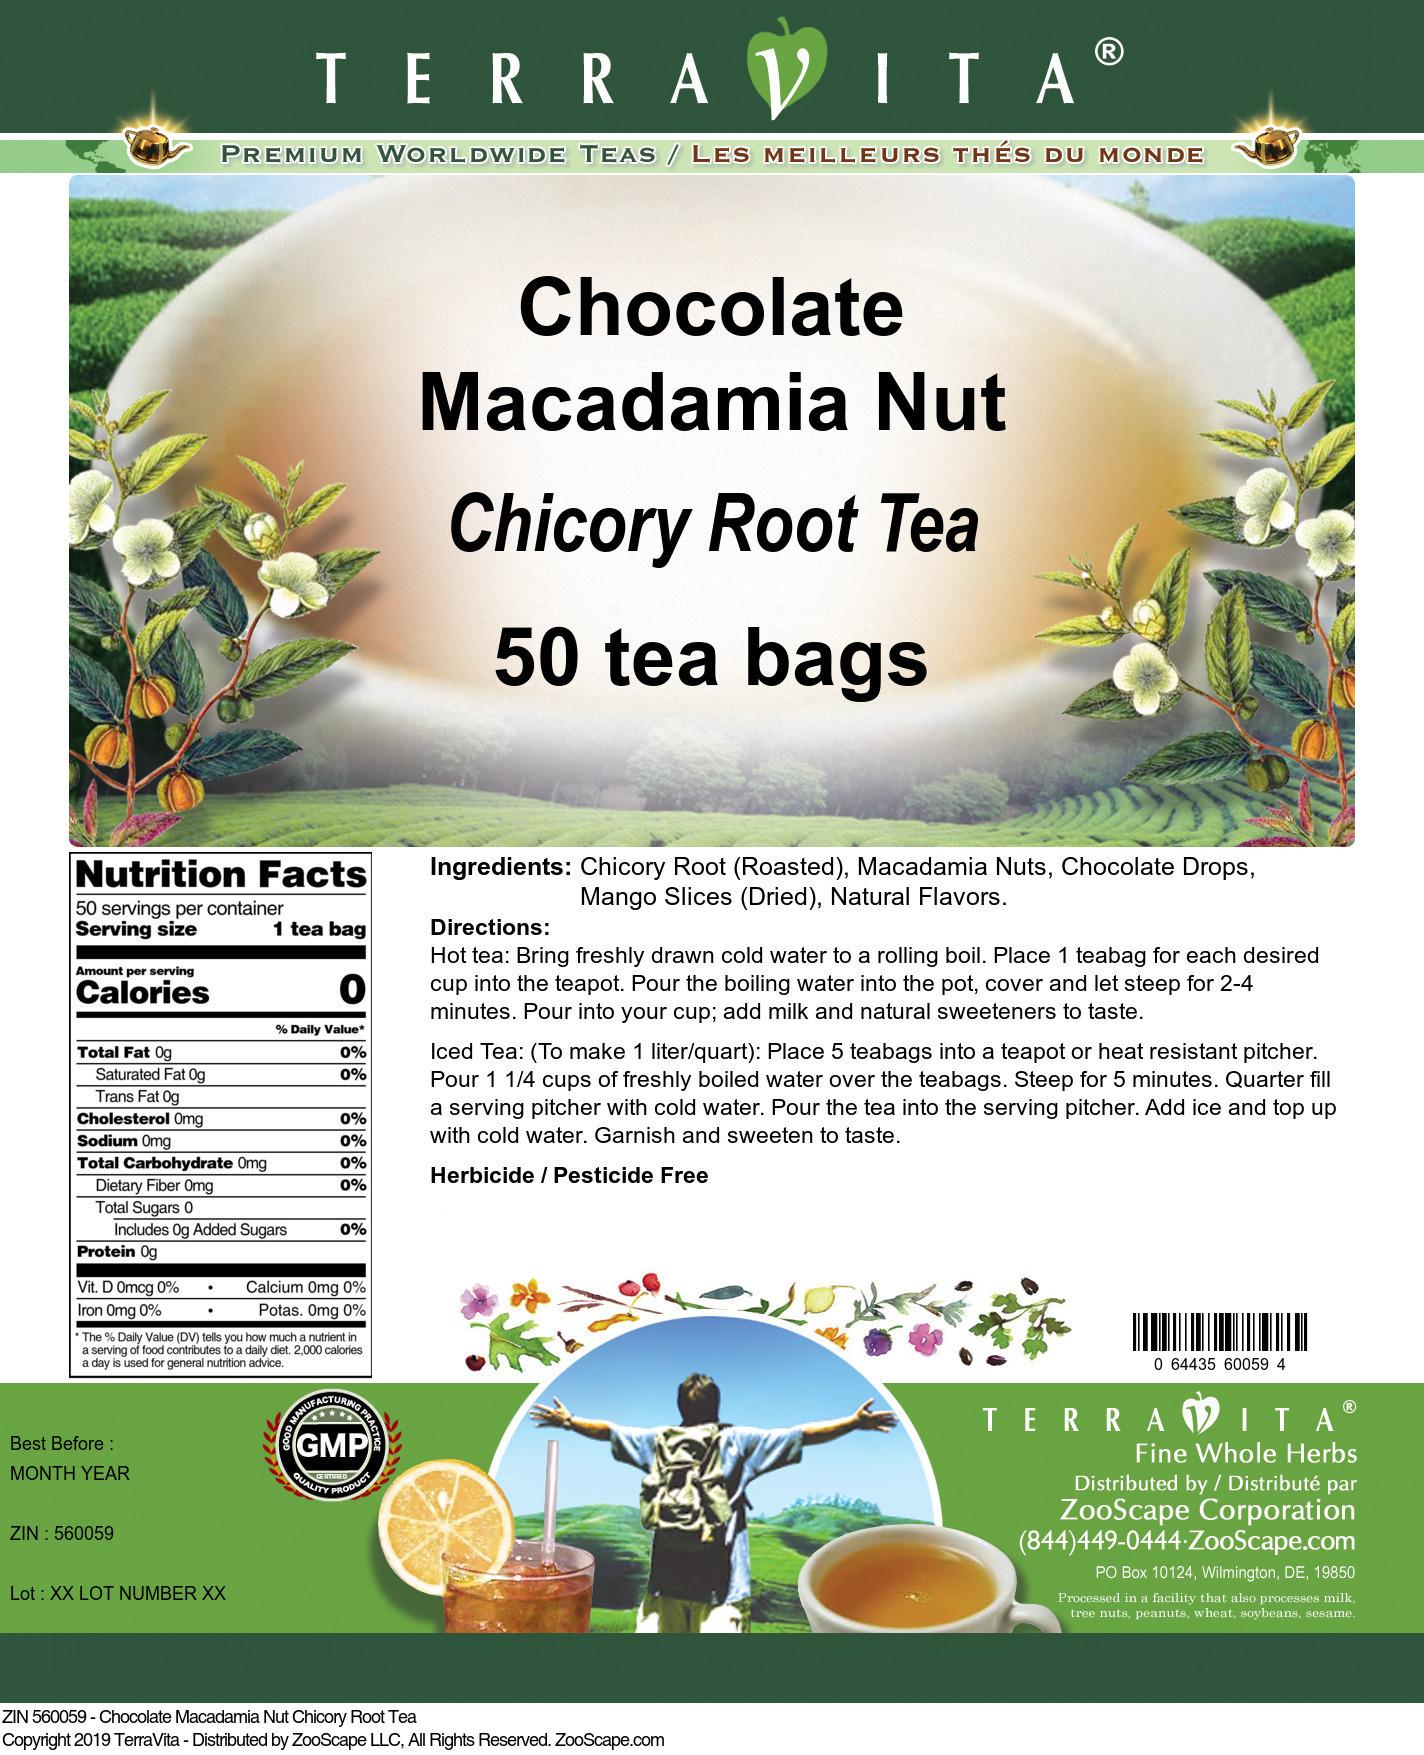 Chocolate Macadamia Nut Chicory Root